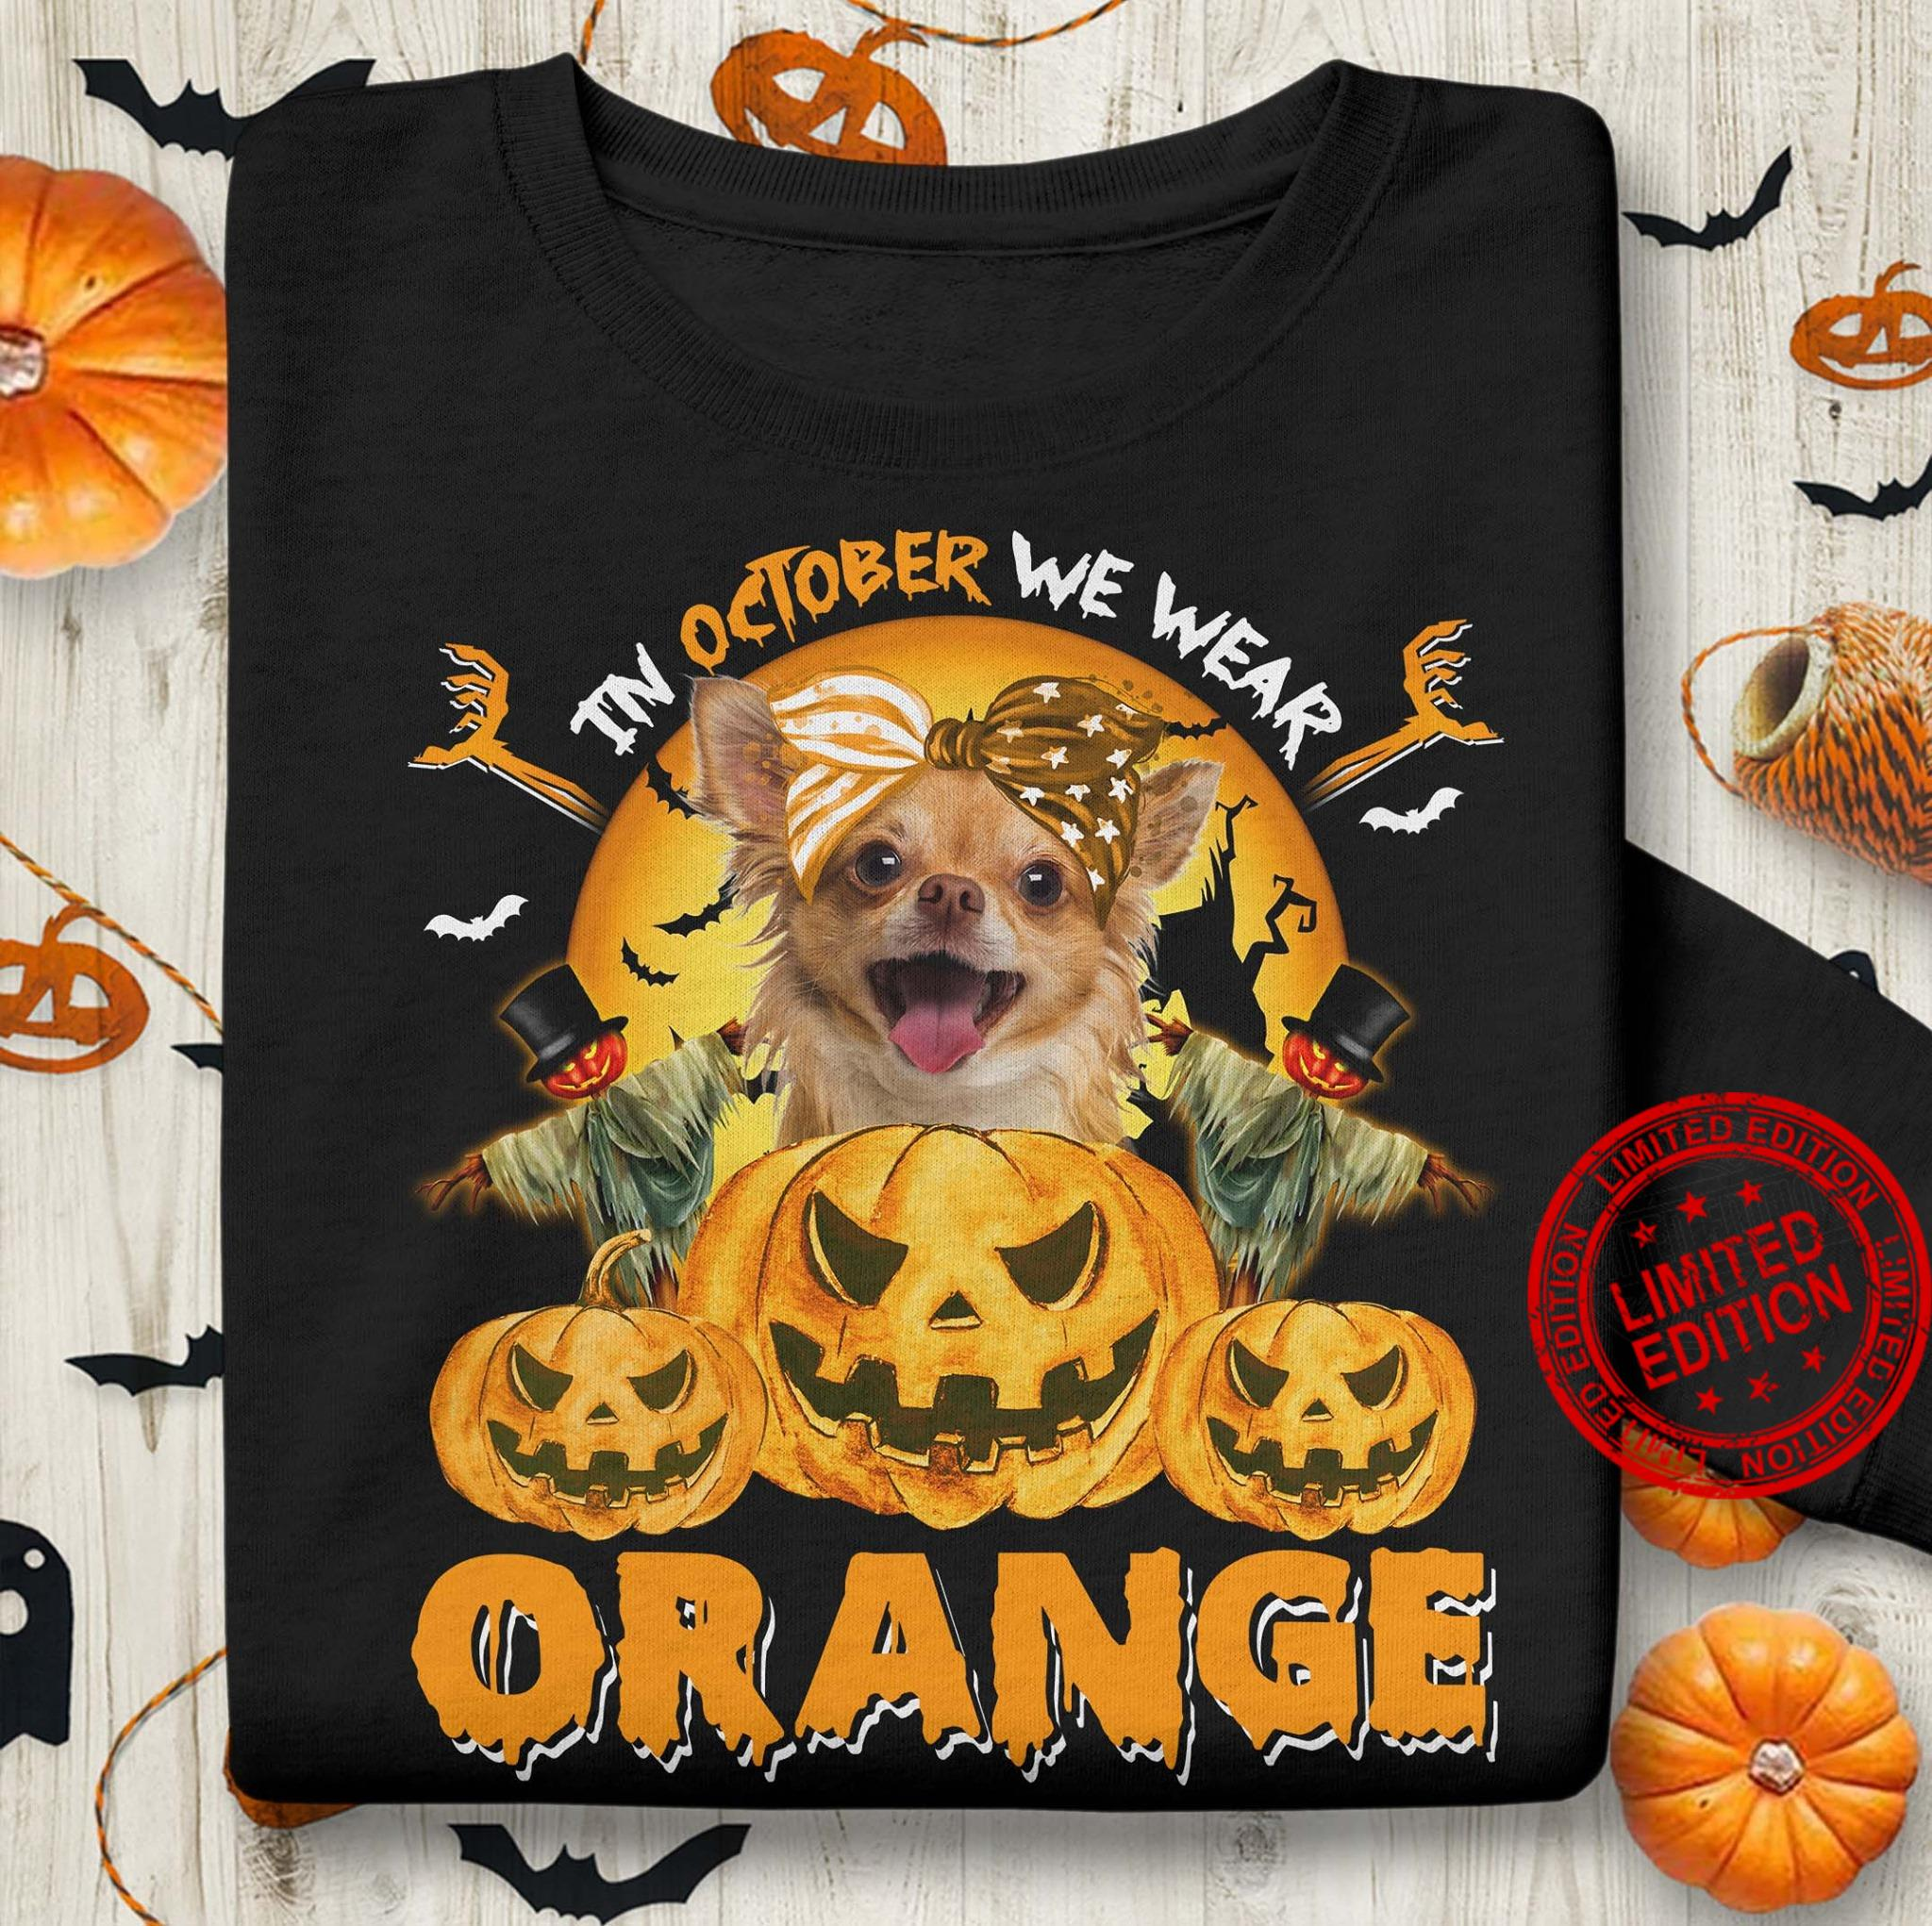 In October We Wear Orange Shirt